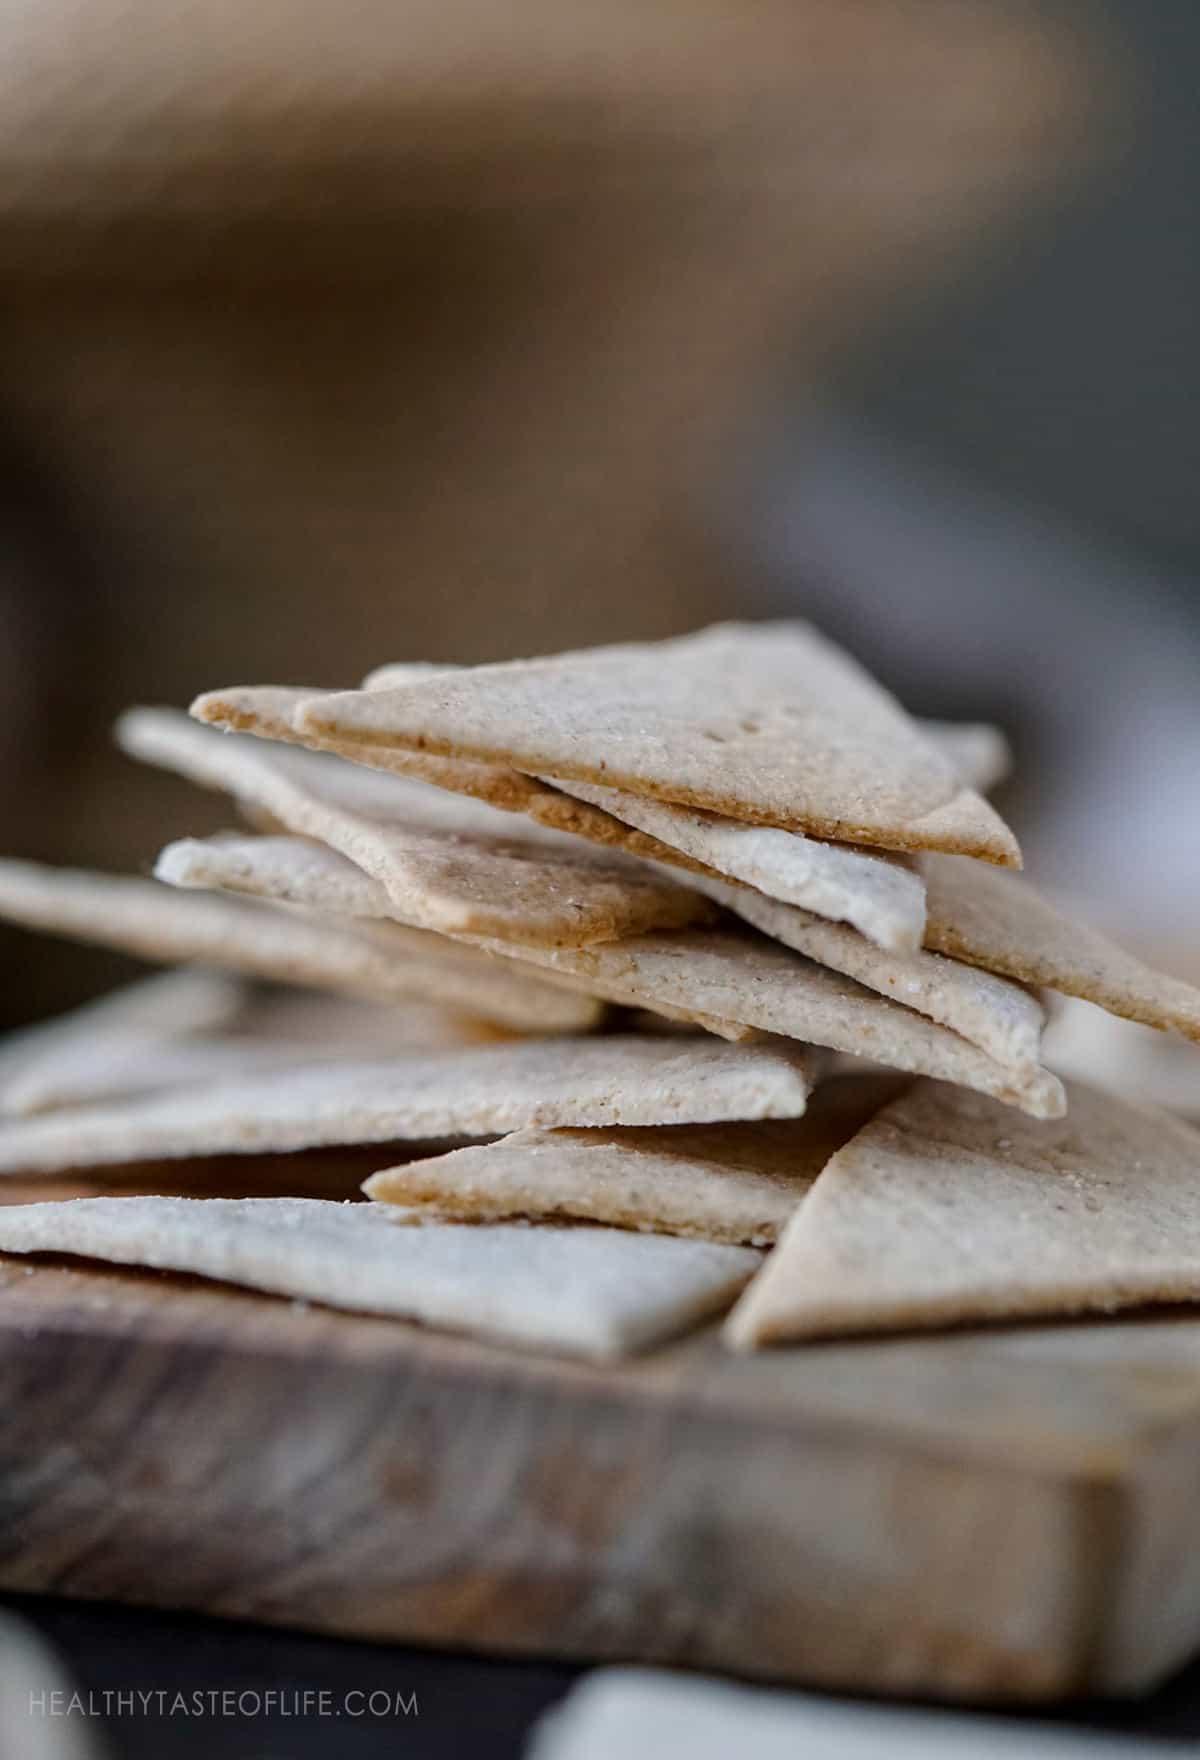 Cassava and tigernut crackers - crunchy crispy thin crackers made with grain free flours like cassava, tigenut and flax seeds.